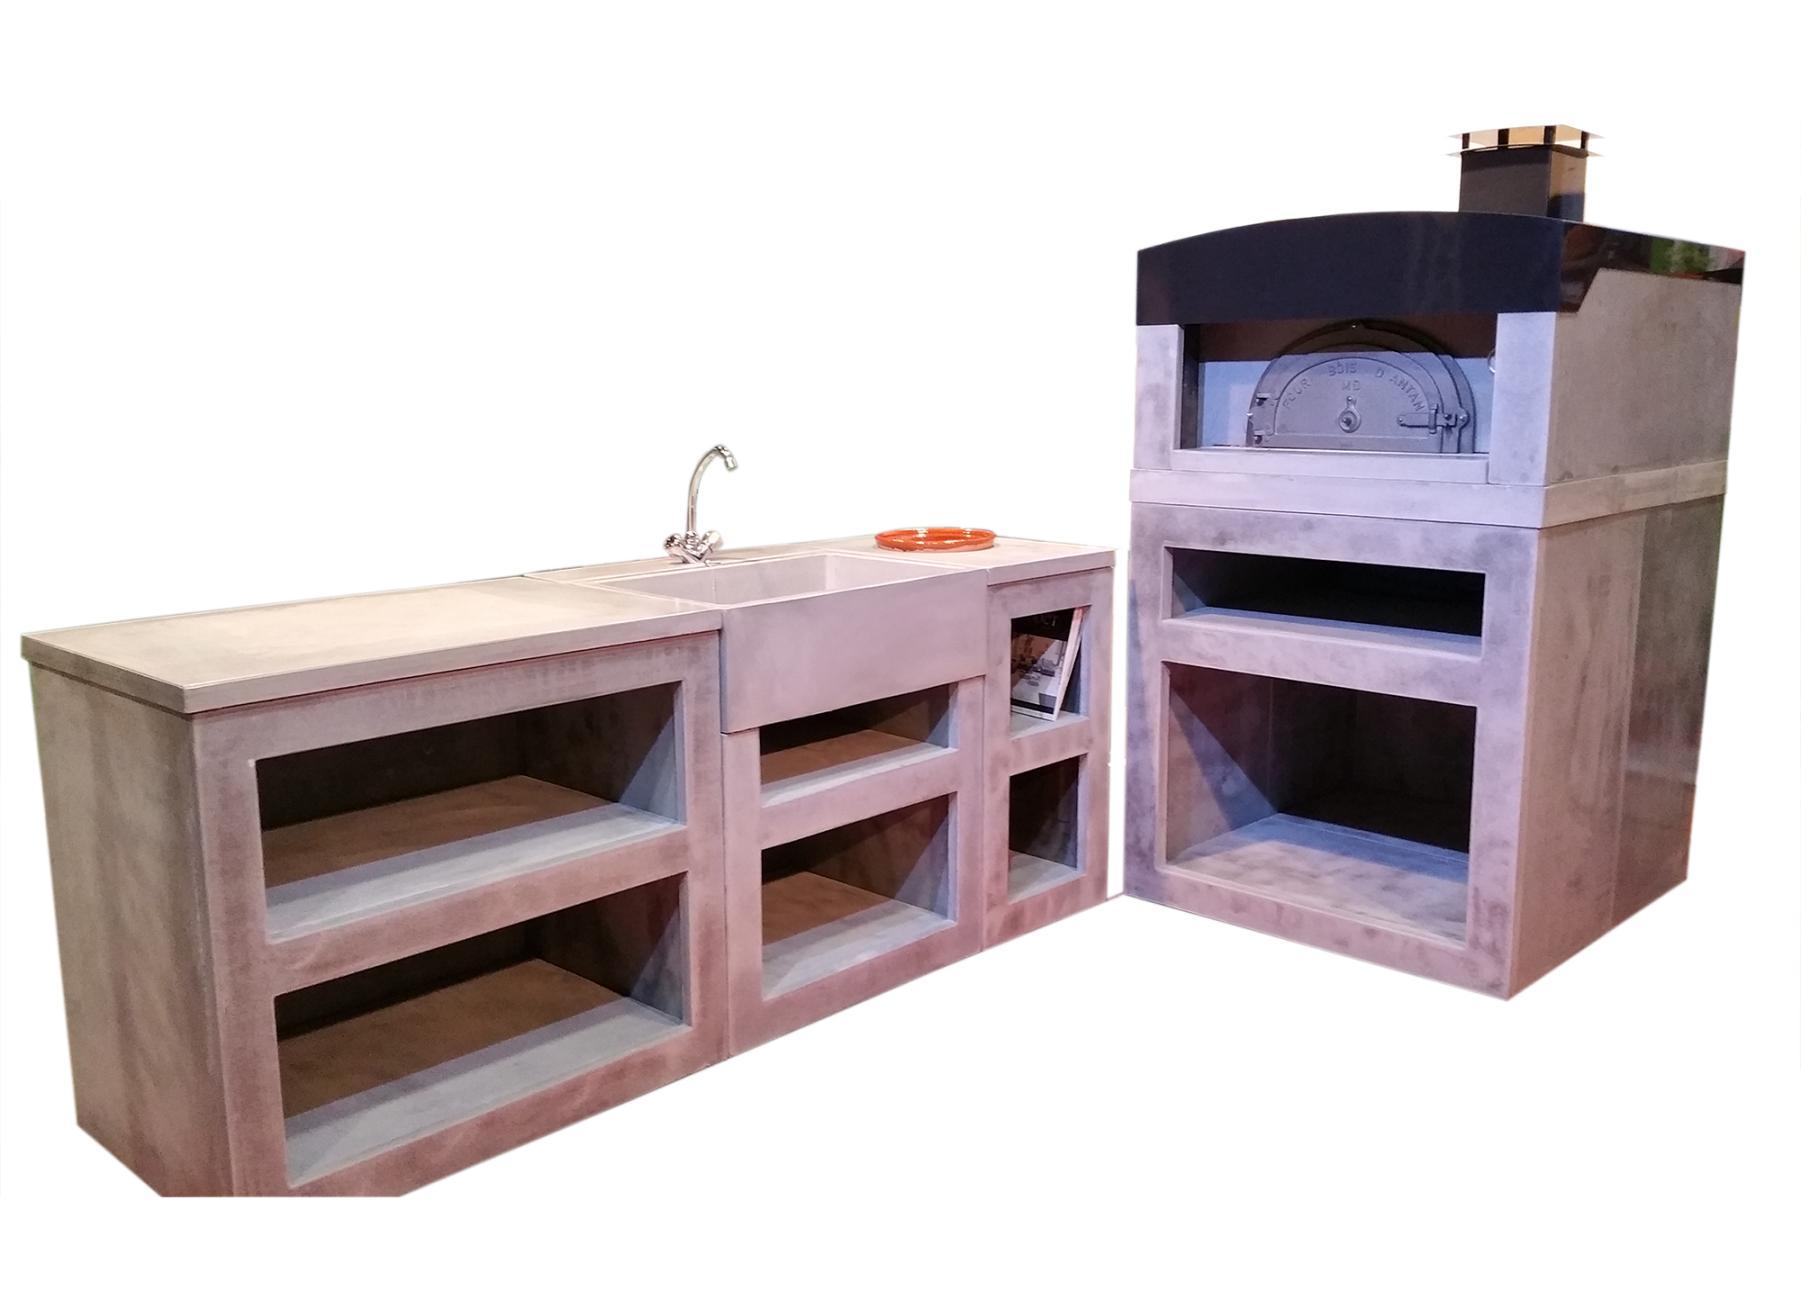 cuisine d 39 t el gance la pierre d 39 antan. Black Bedroom Furniture Sets. Home Design Ideas